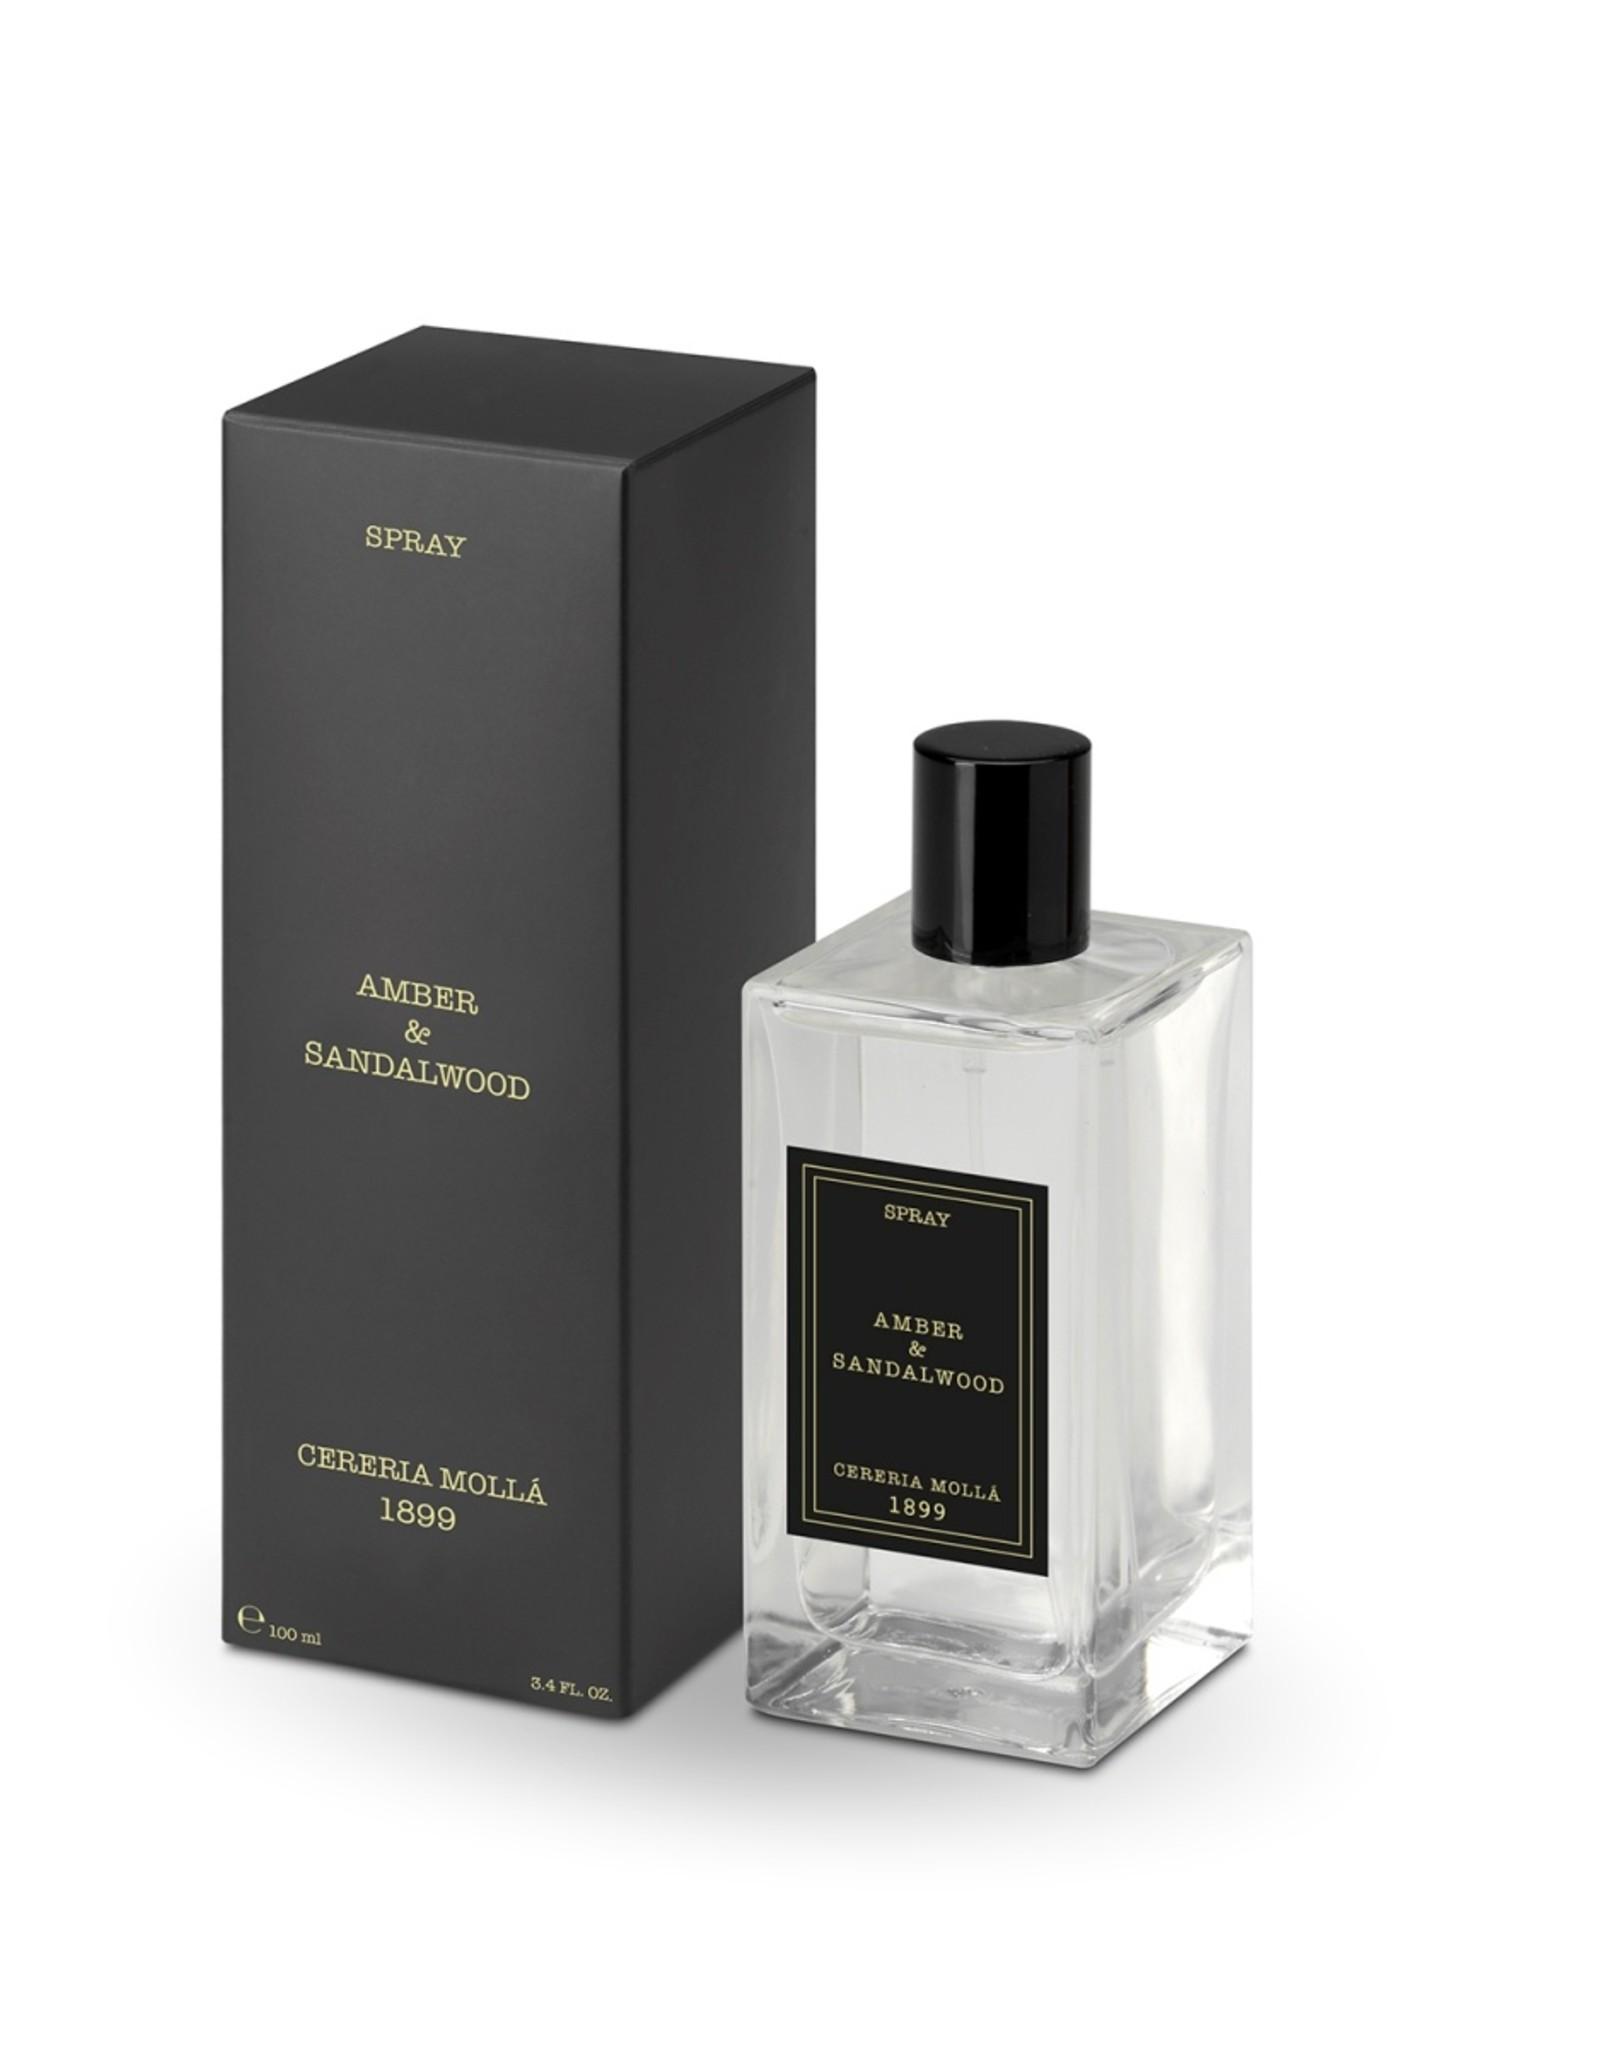 Cerería Mollá 1899 Amber & Sandalwood room spray (100 ml)